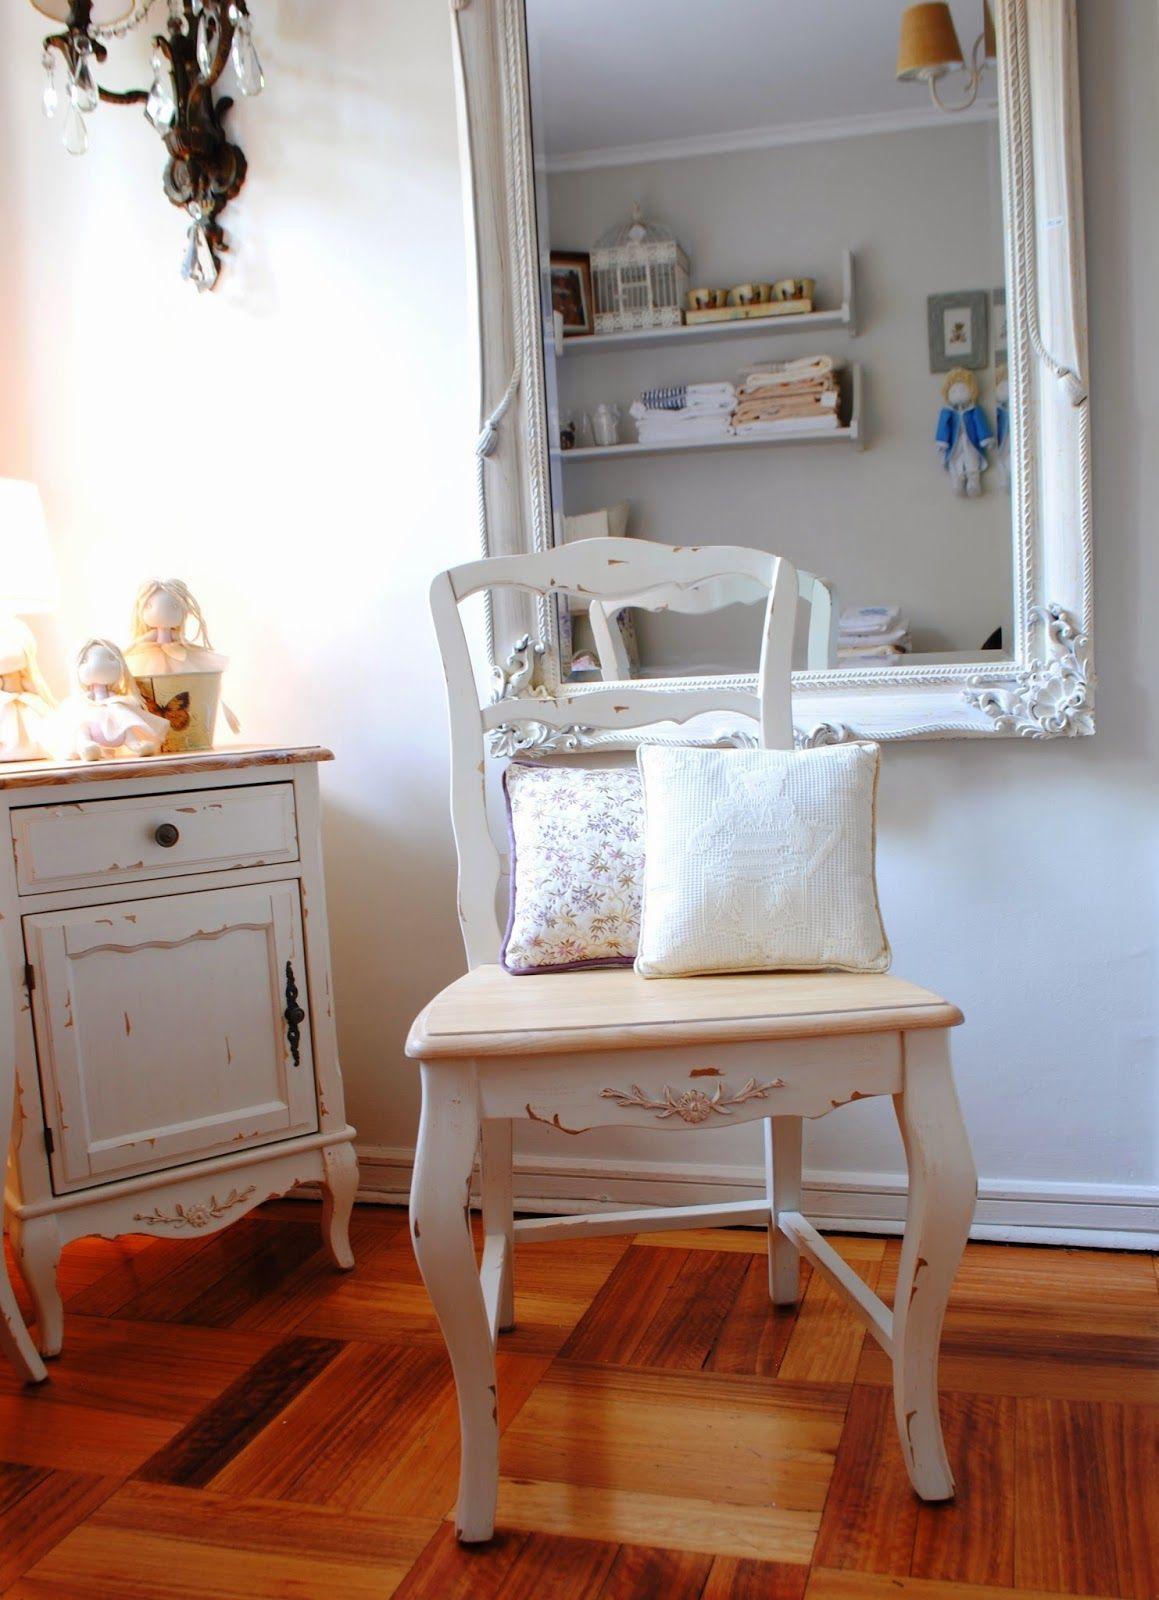 Muebles Kimberly - Paz Montealegre Decoraci N Muebles Muebles Estilo Provenzal [mjhdah]https://lookaside.fbsbx.com/lookaside/crawler/media/?media_id=1527499920818034